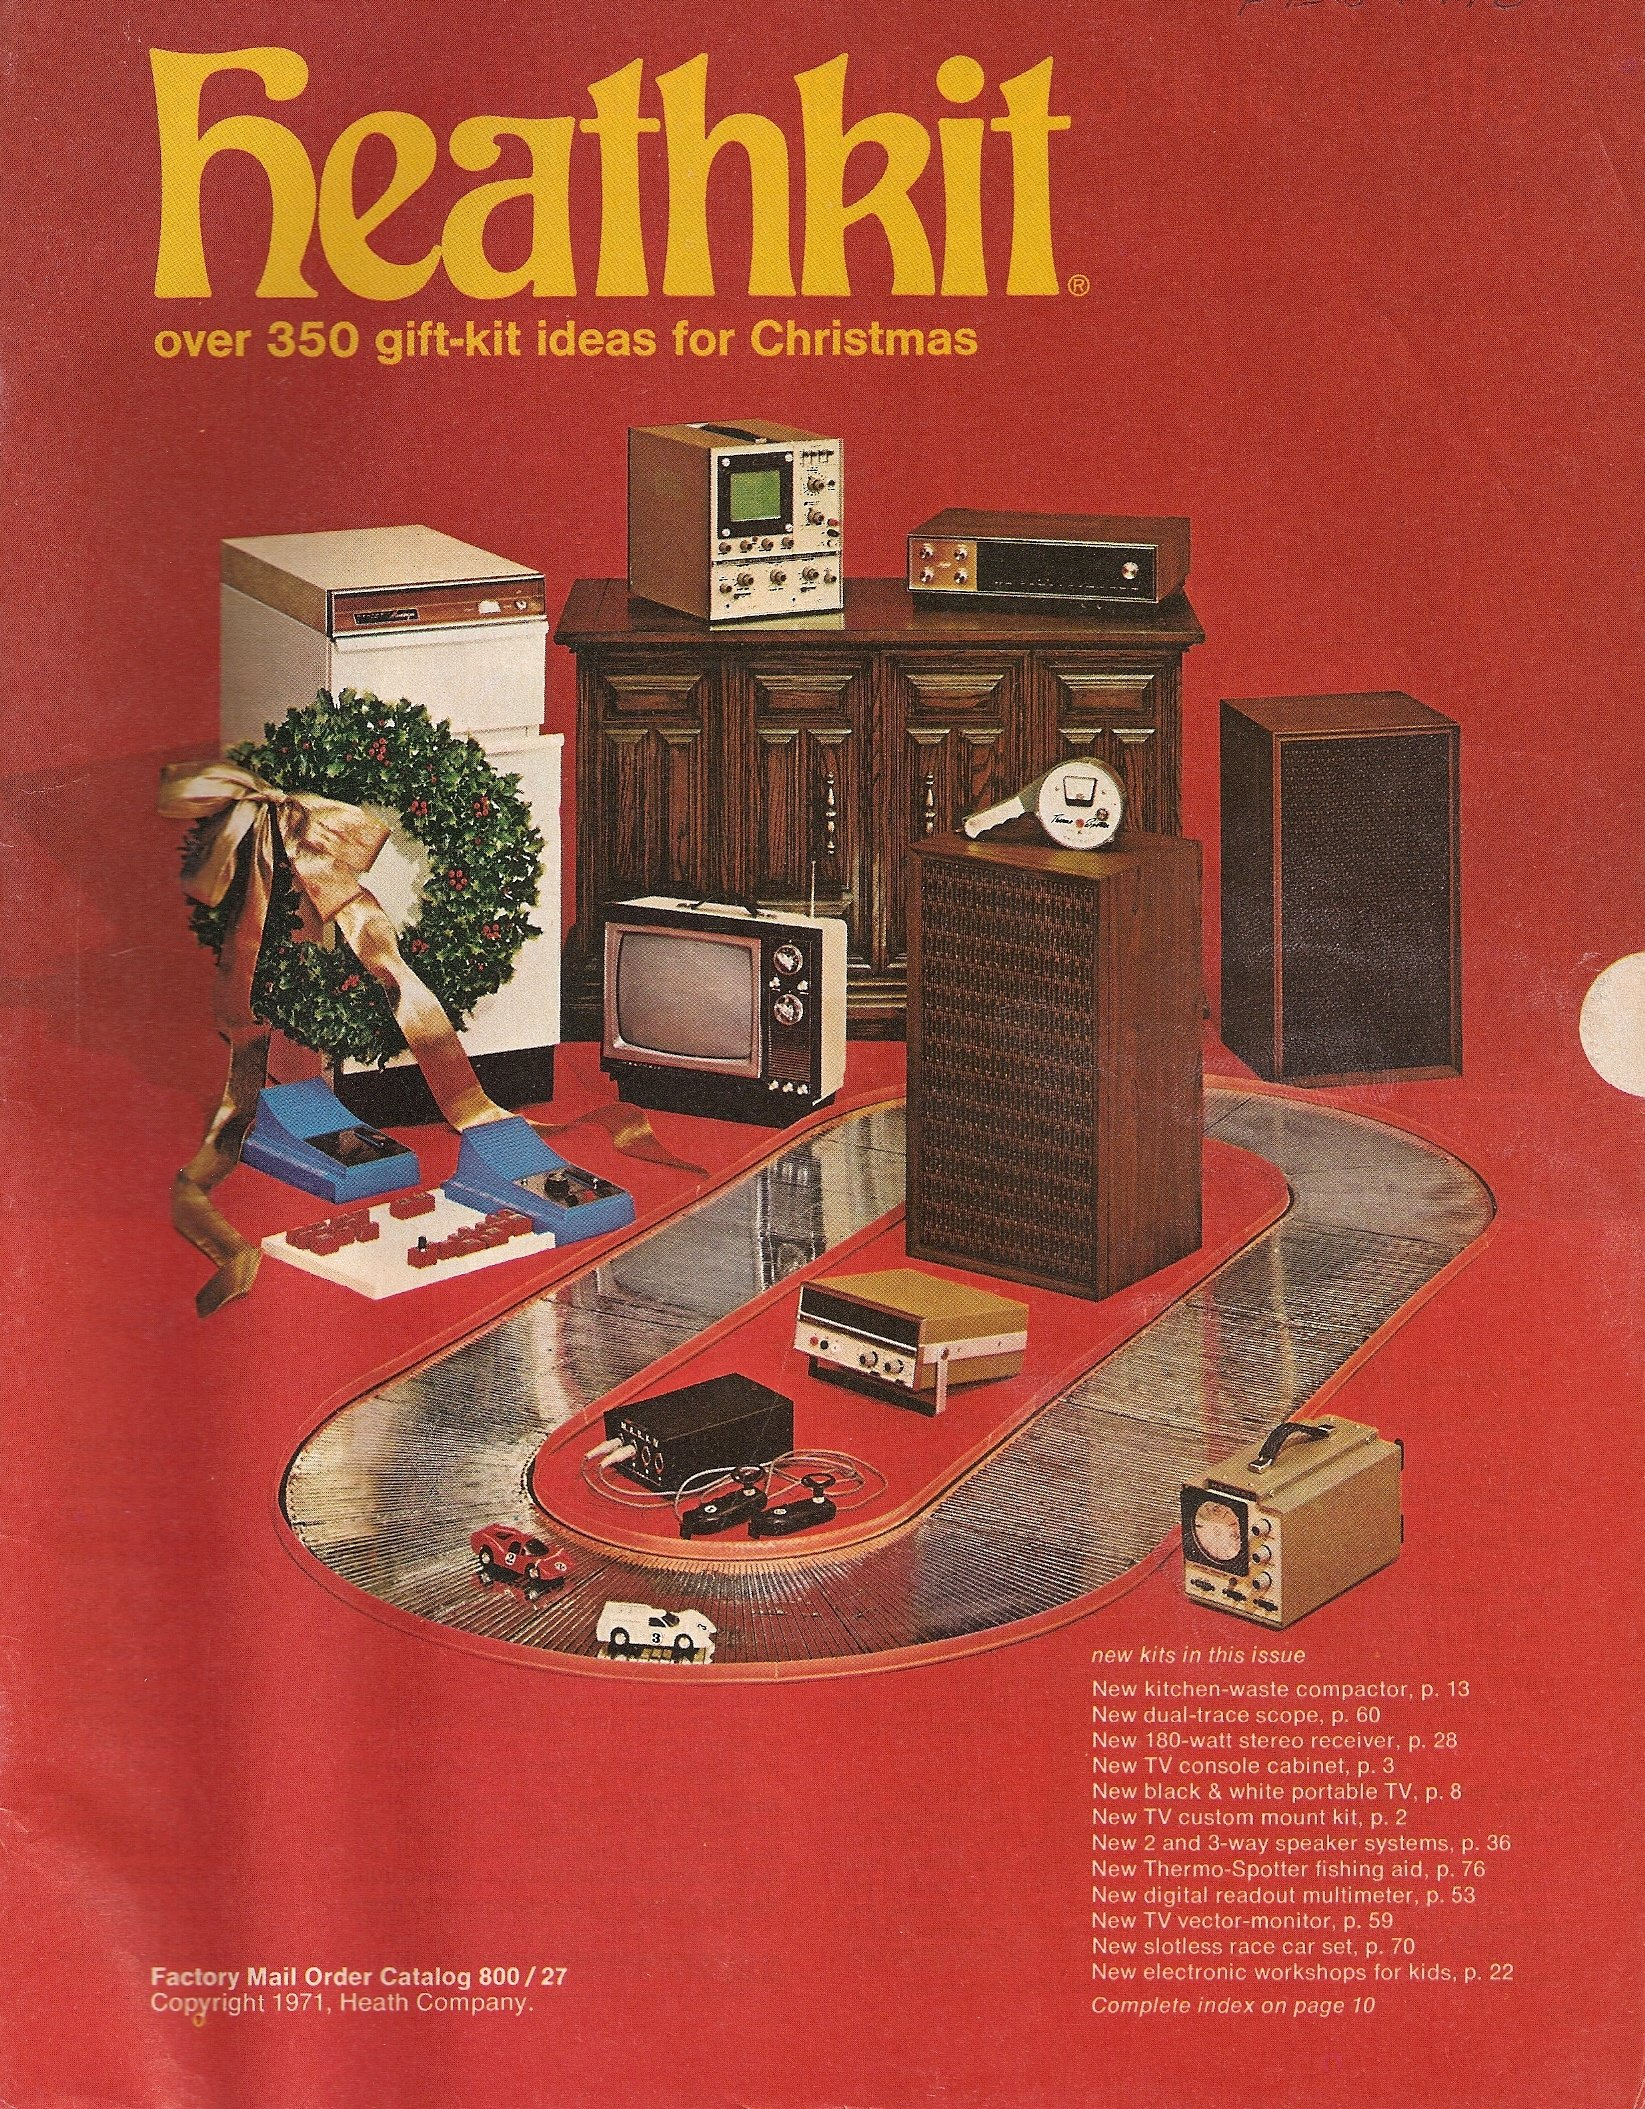 Heathkit Factory Mail Order Catalog 800 / 27, 1971 (Over 350 Gift-Kit Ideas for Christmas) Paperback – 1971